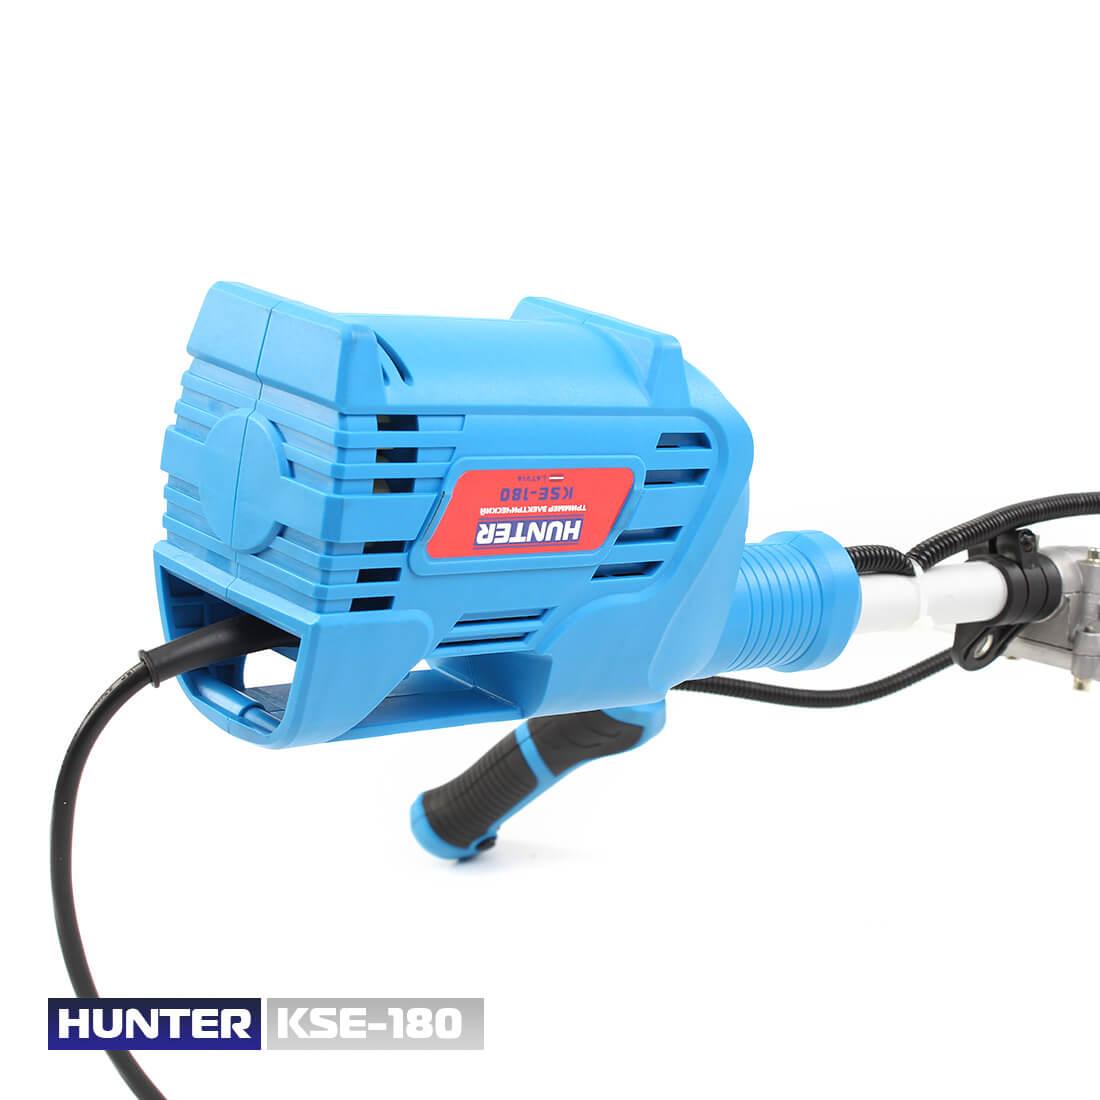 Фото Электрический триммер KSE-180 цена 2300грн №3 — Hunter